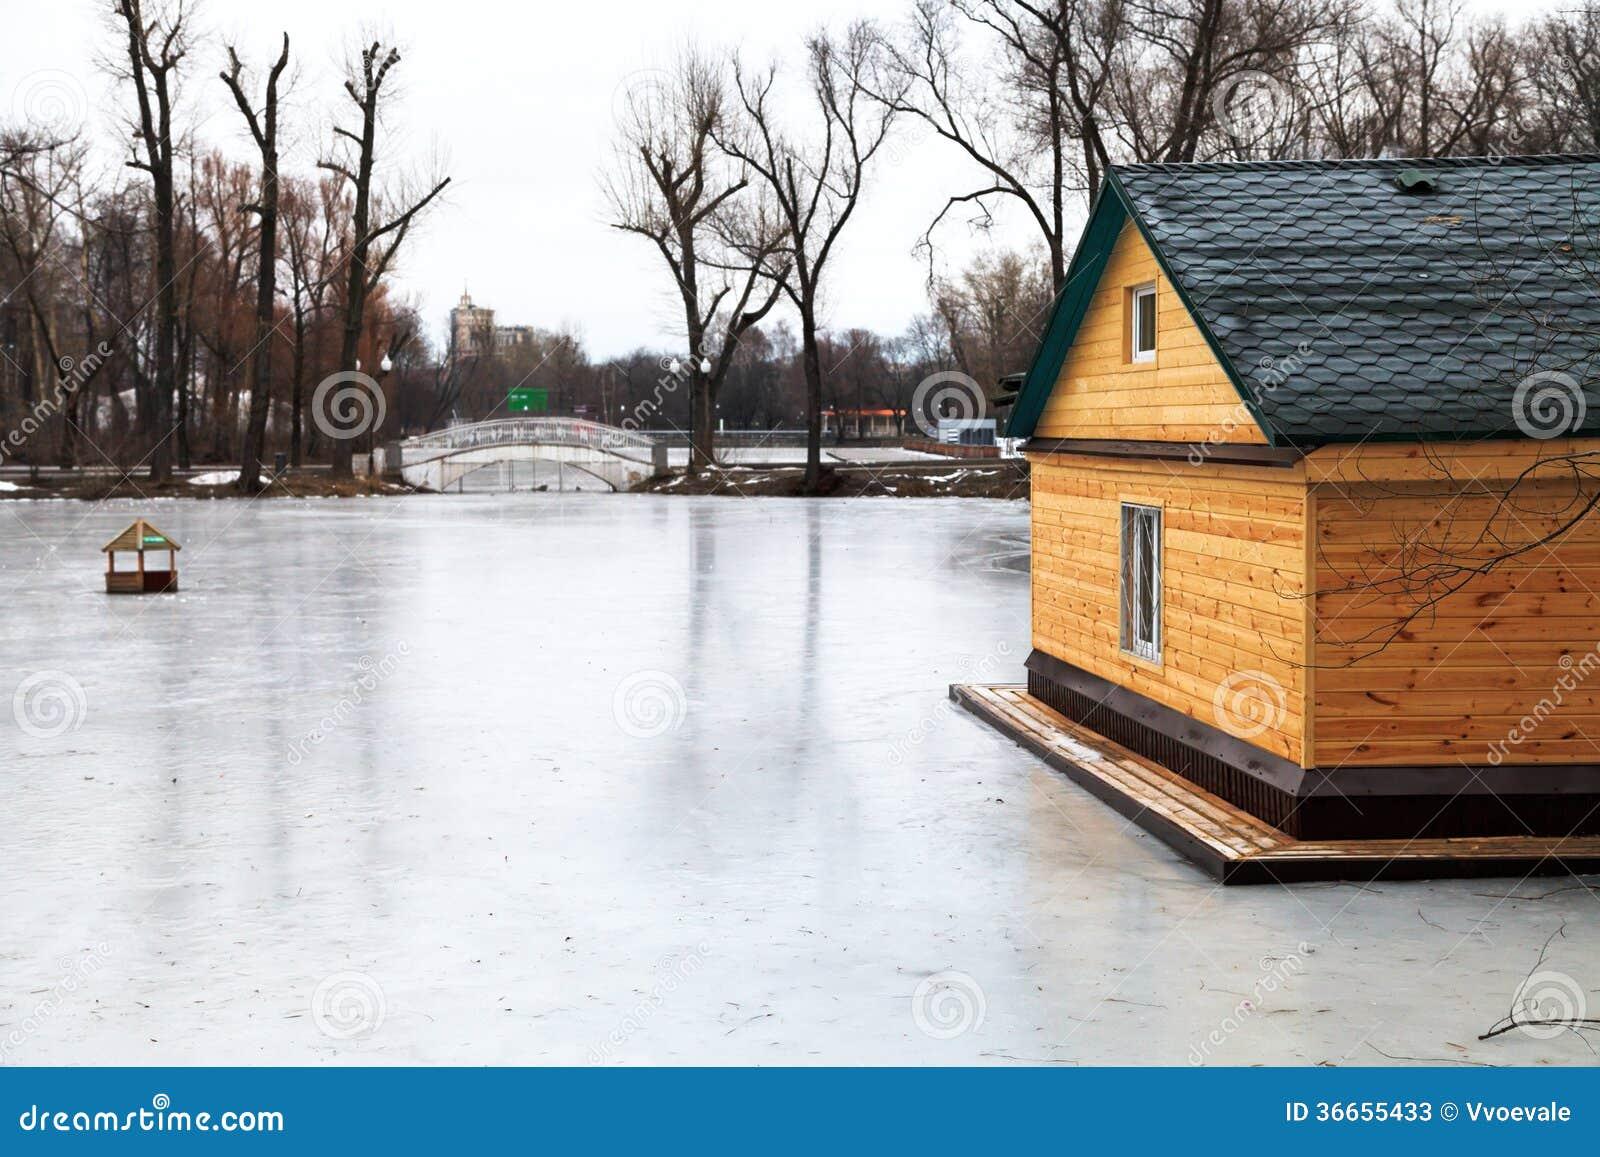 frozen-lake-bridge-wooden-house-winter-day-36655433 Ice House Plans Wooden on folding ice house, pvc ice house, aluminum ice house, motorized ice house,